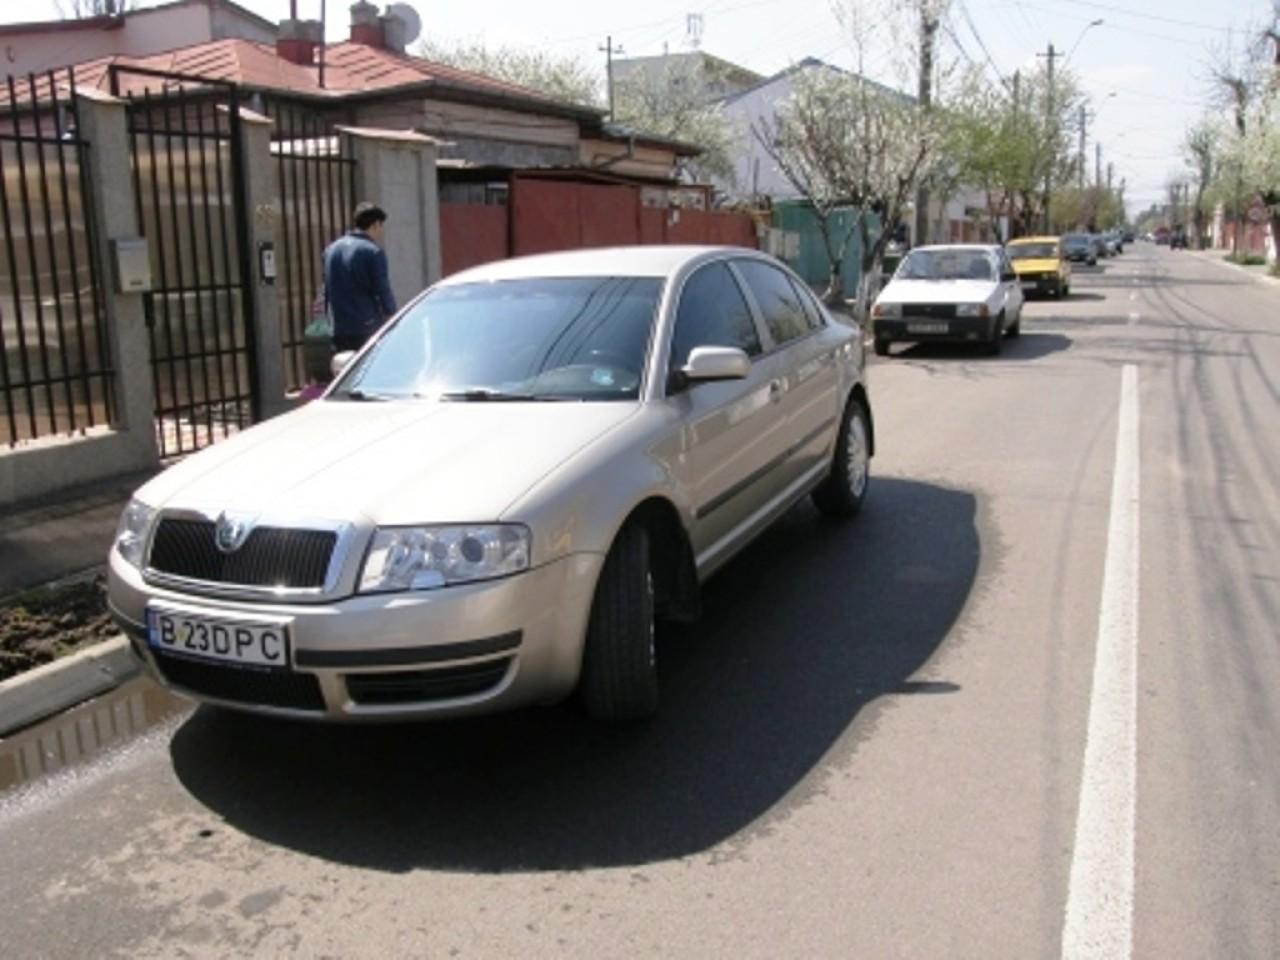 Skoda Superb 19 tdi 2006